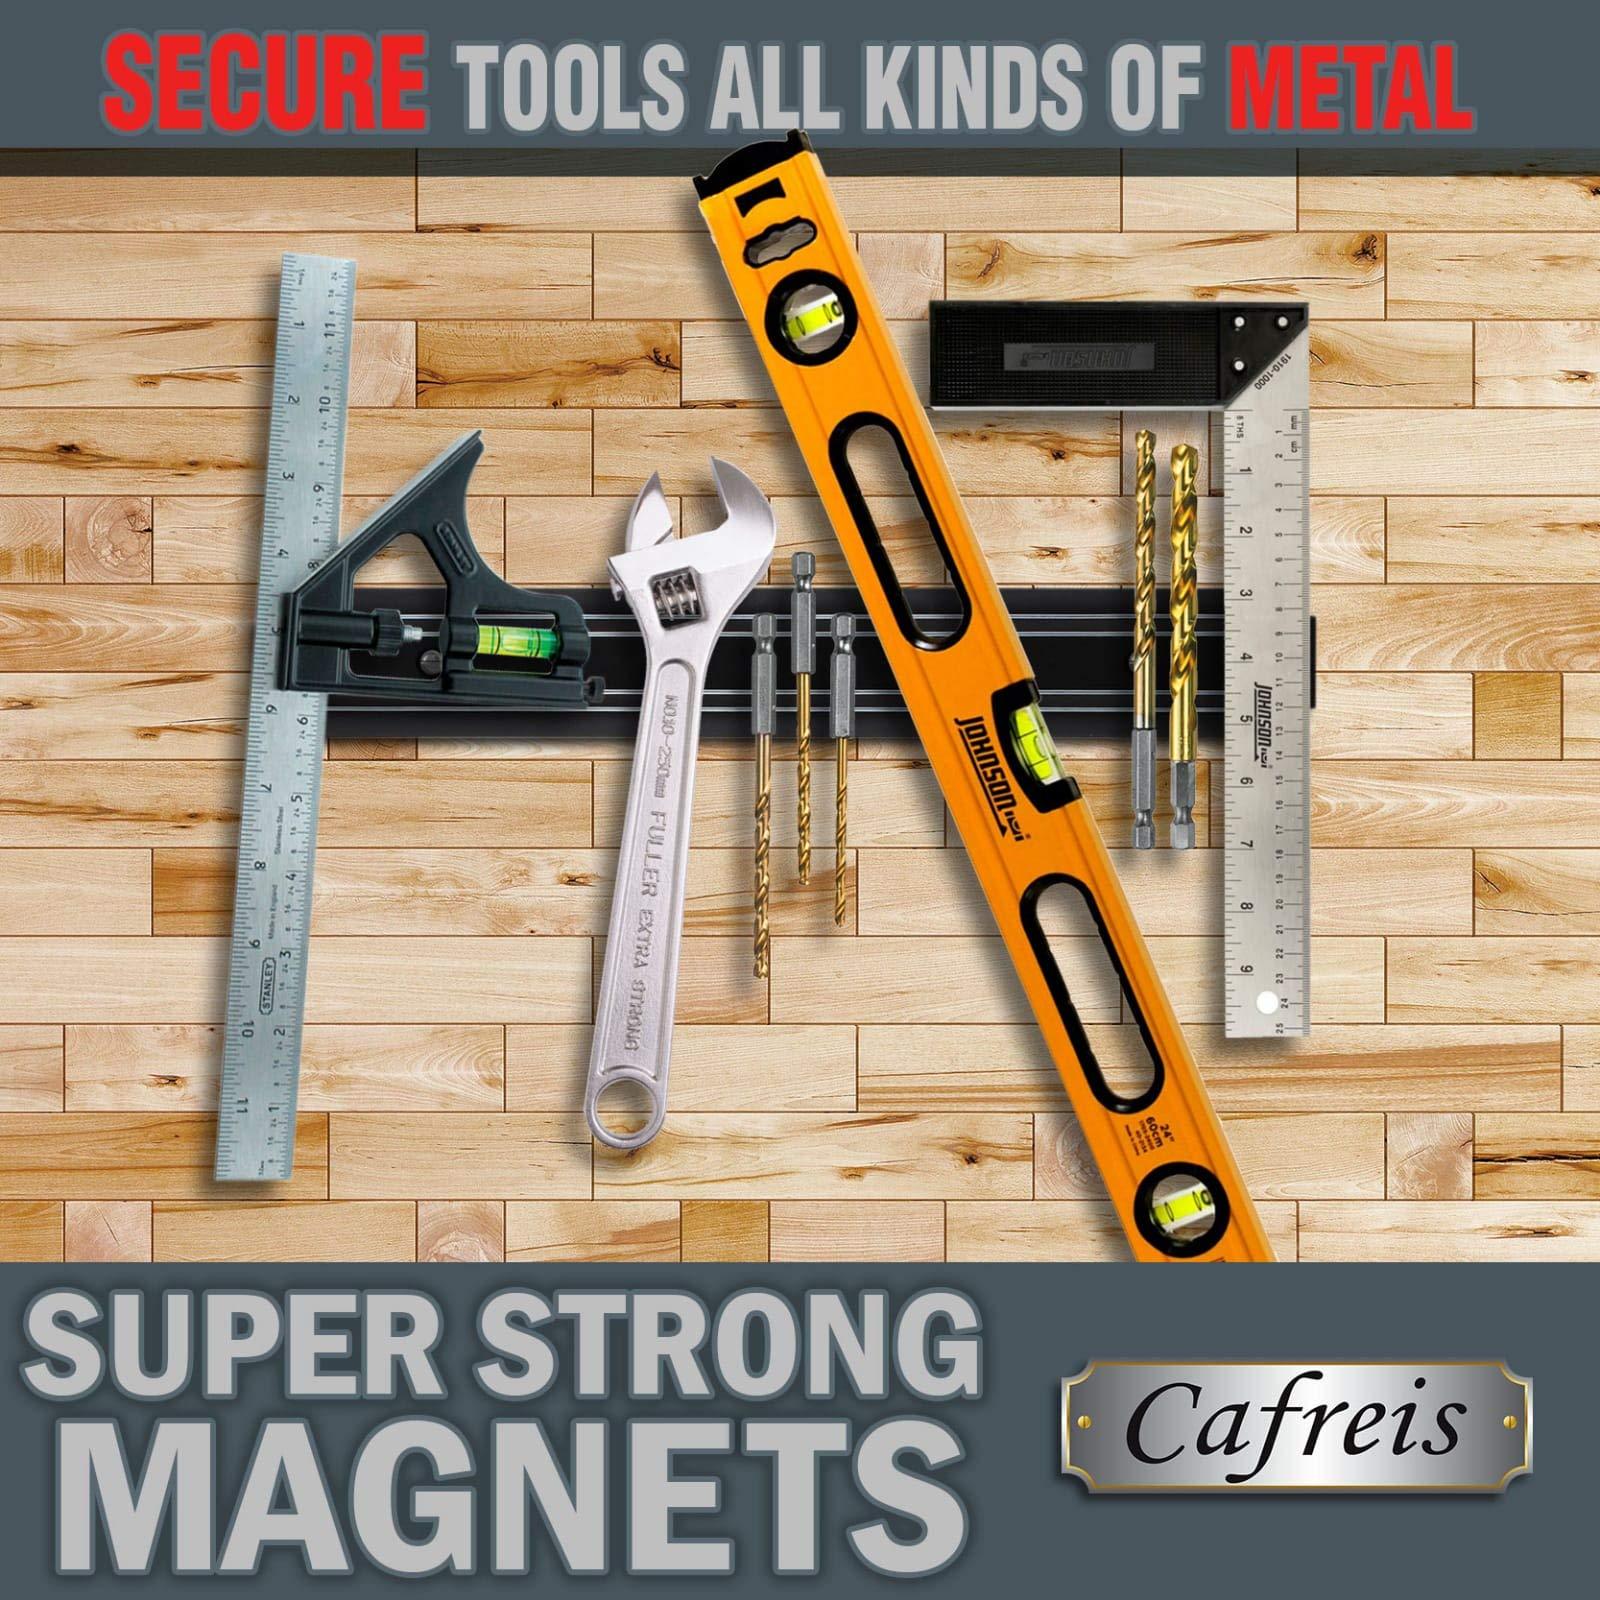 MAGNETO, 13 Inch Plastic Magnetic Knife bar, Knife Holder bar, Magnetic Storage Rack Strip, Magnetic Tool Organizer by Cafreis (Image #7)